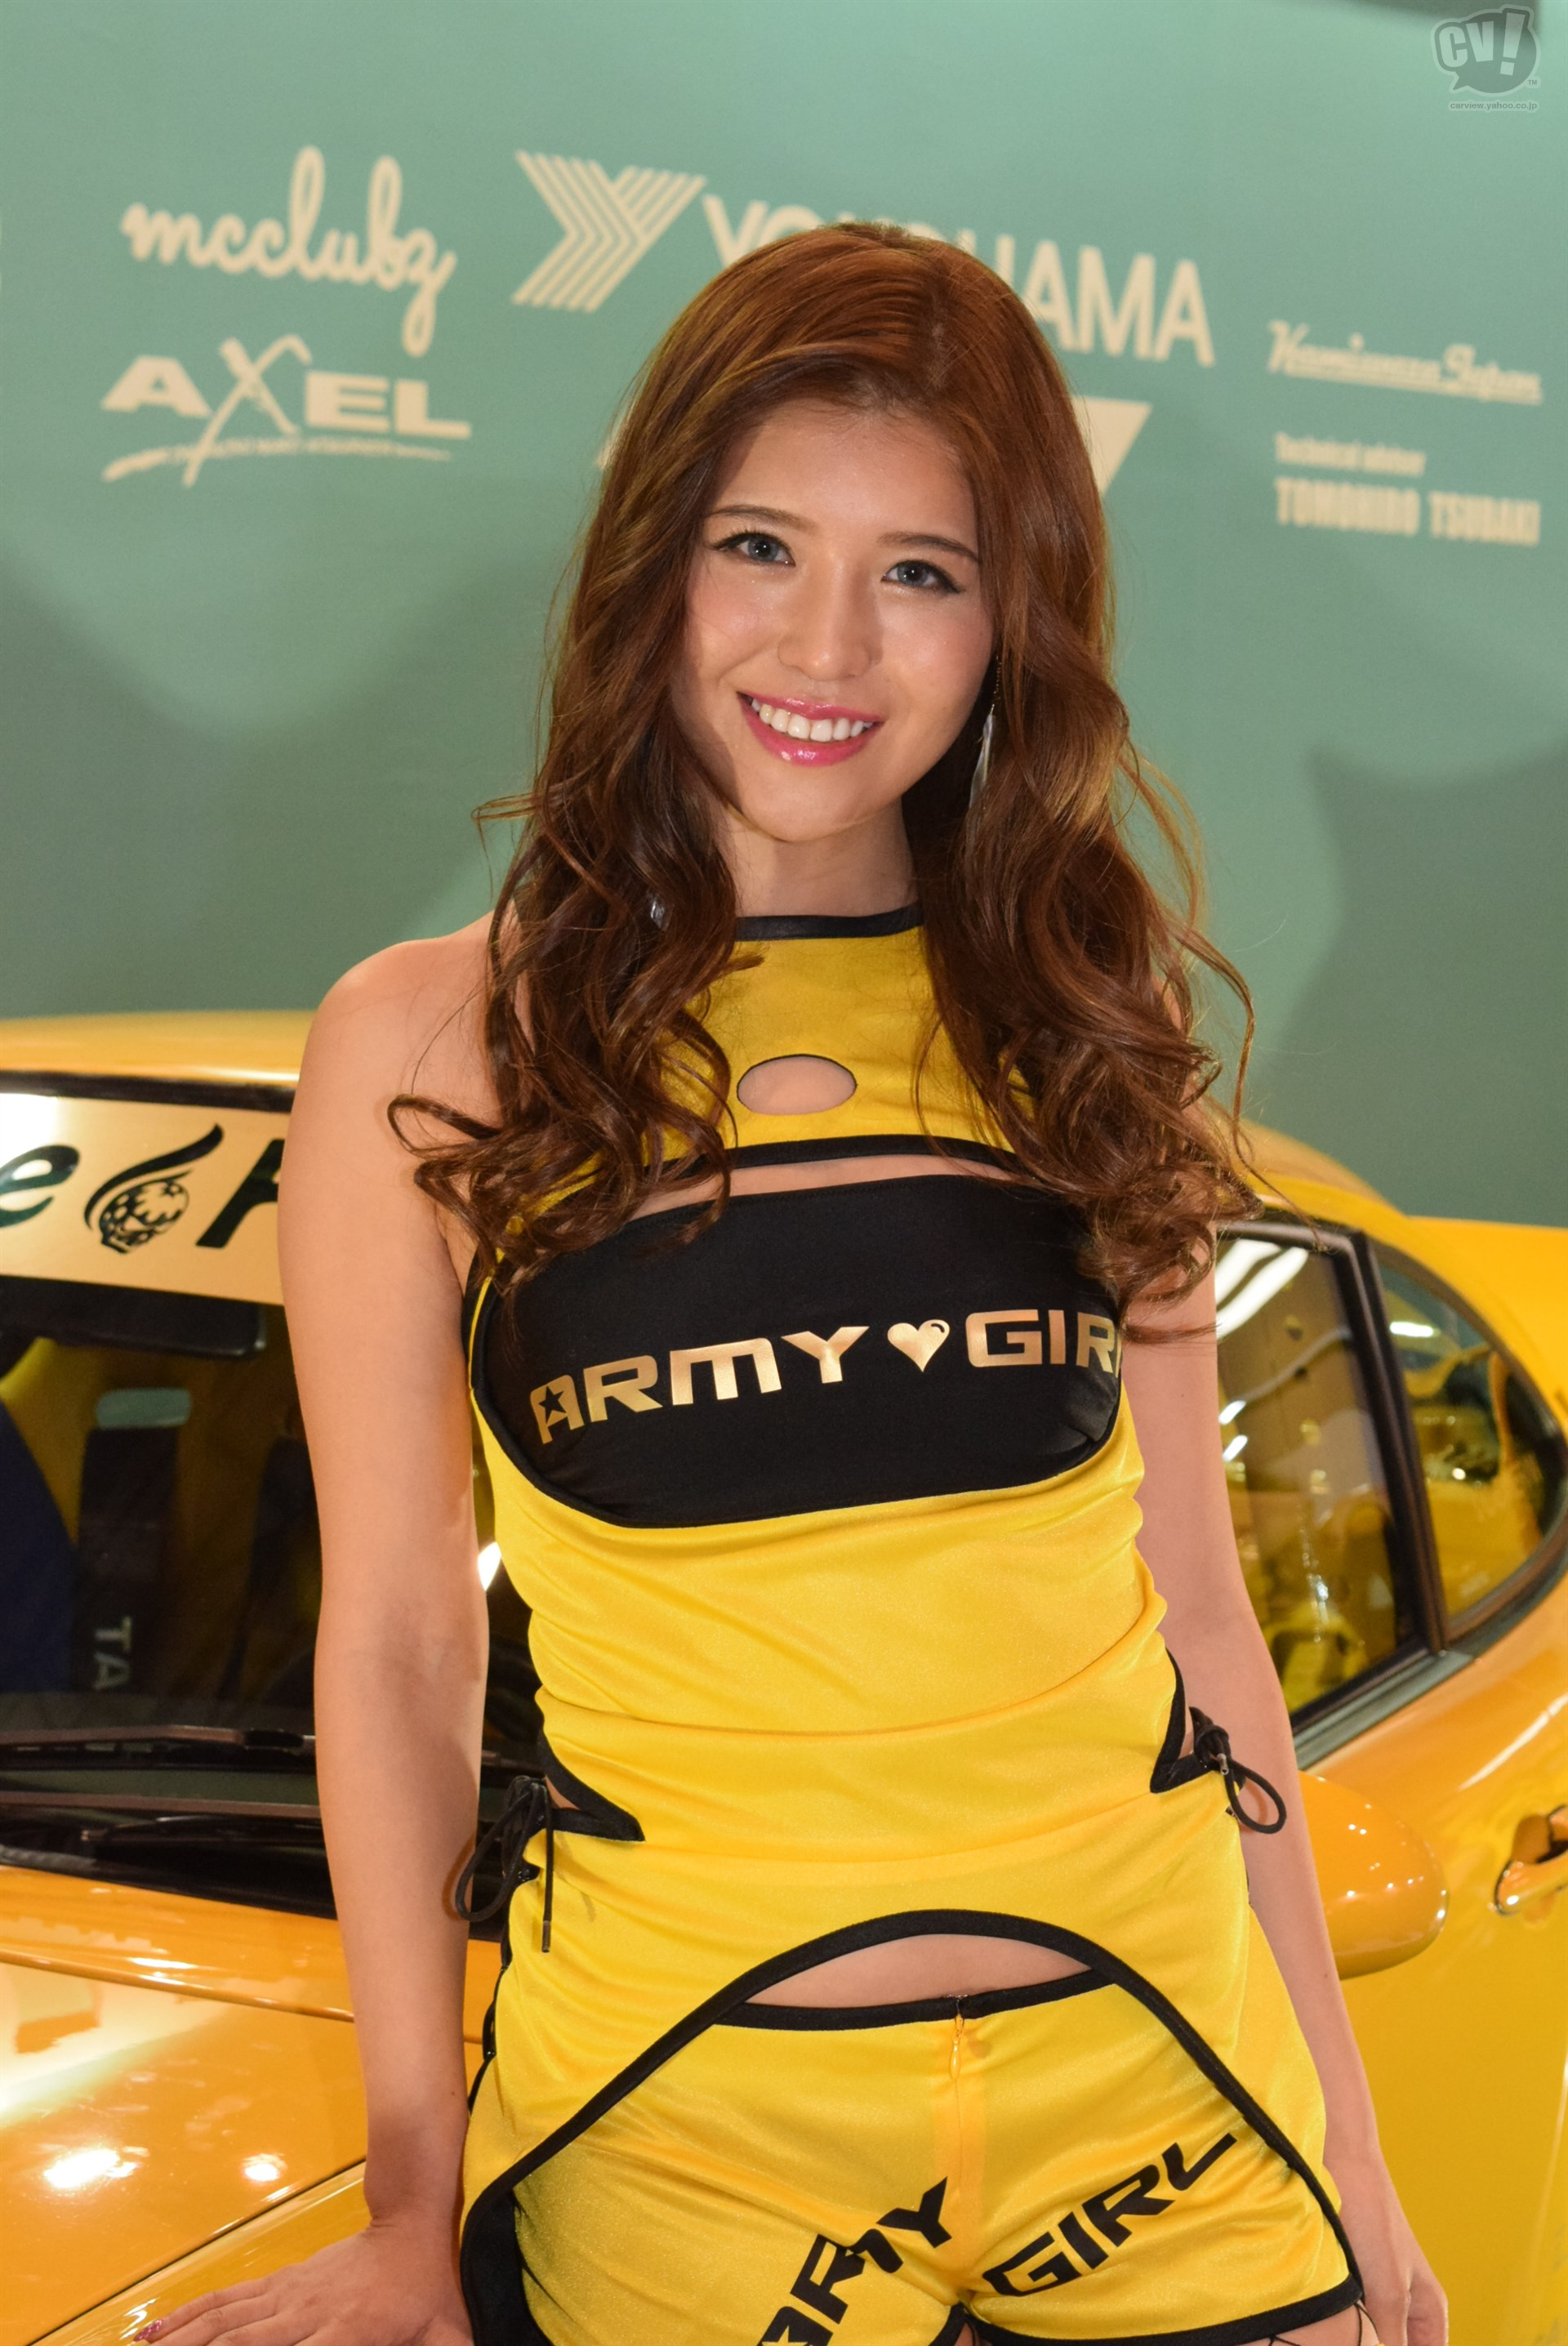 ARMY GIRL vol.6